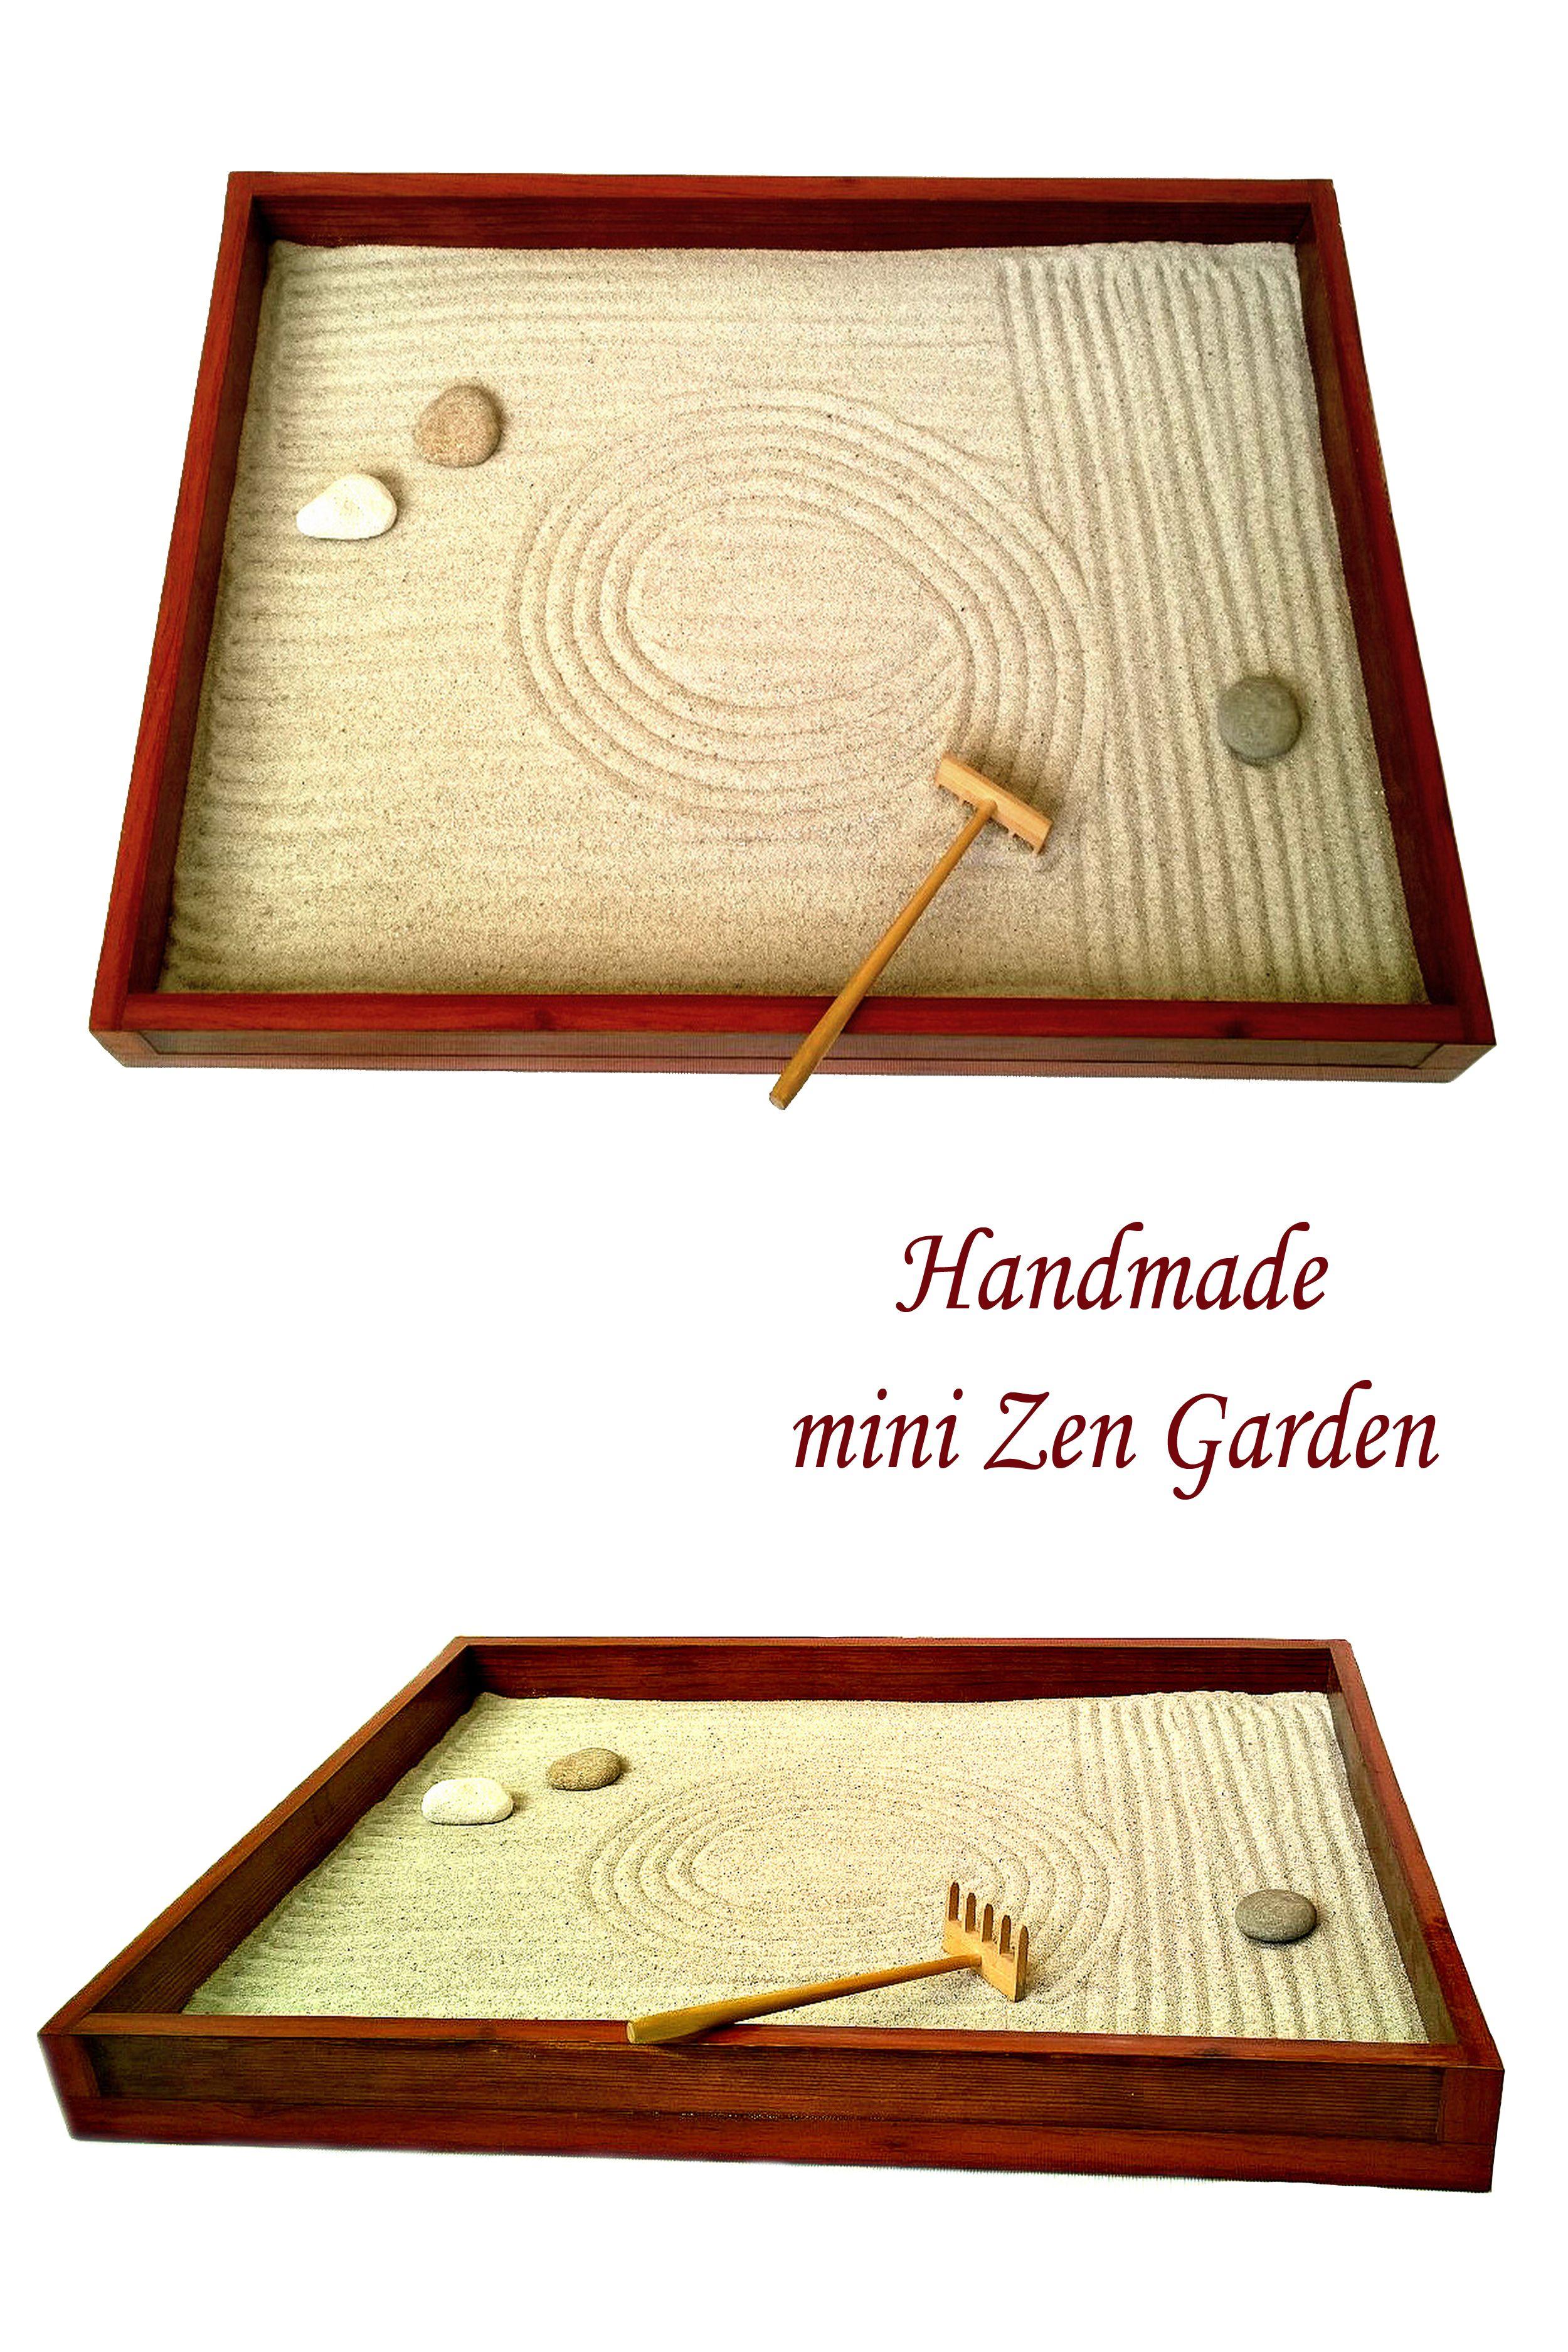 Natural Wood Handmade Zen Garden Perfect Decorative Iteam For Home Or Office Rakes Stones And Sand Are Also Included Zen Garden Mini Zen Garden Wooden Decor